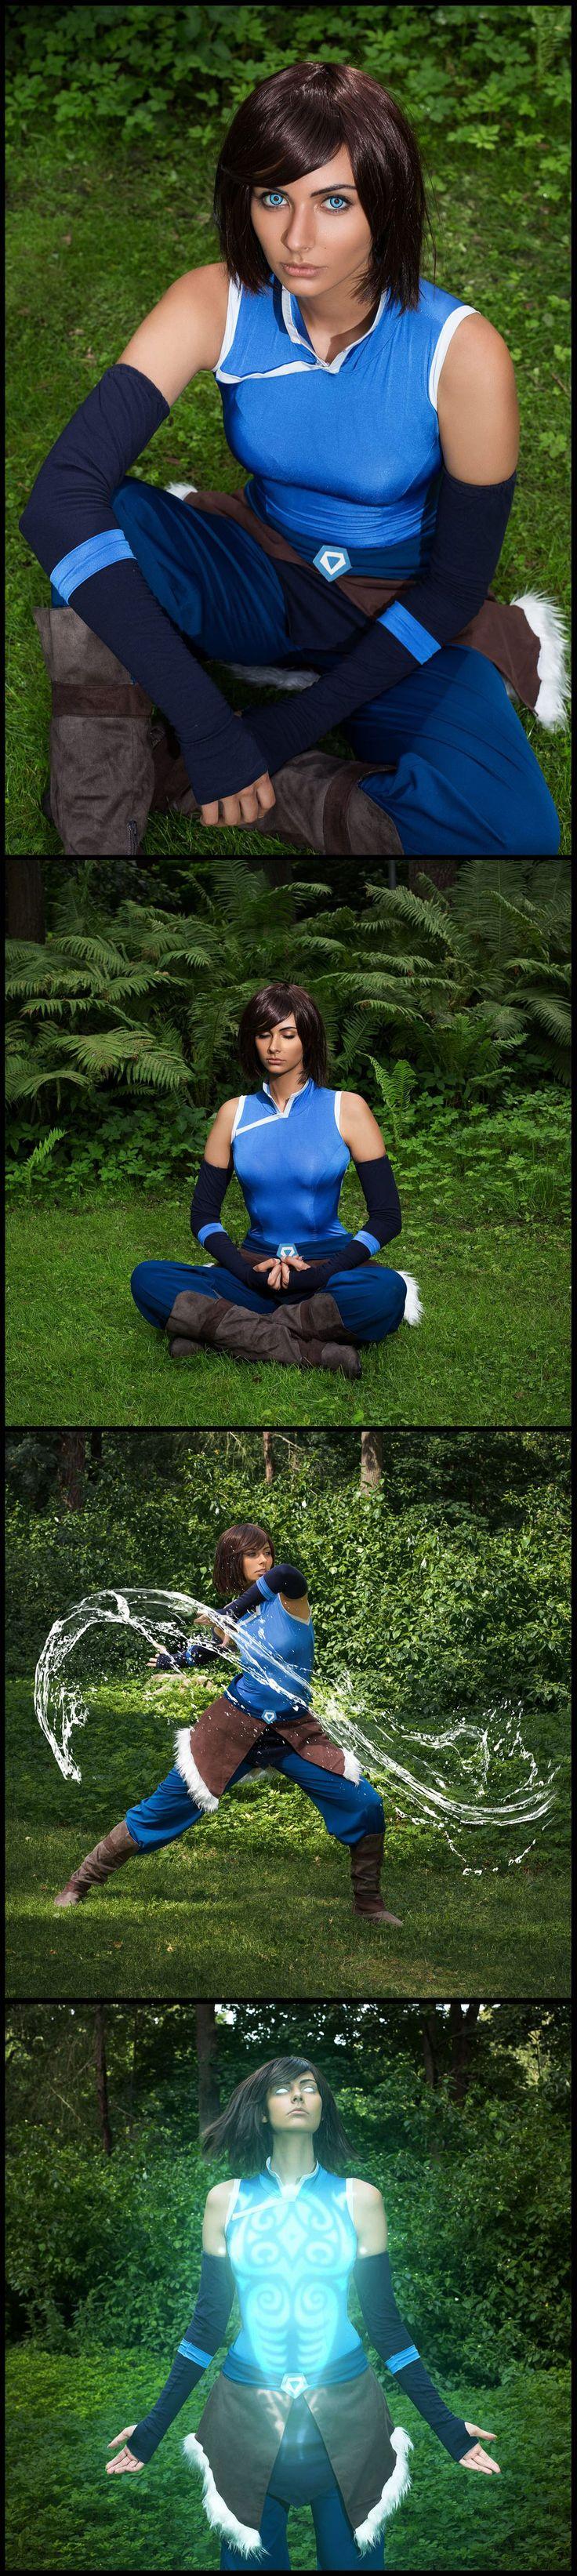 Avatar Korra by Russian Cosplayer @AnnetBlueWolf Super Hero shirts, Gadgets